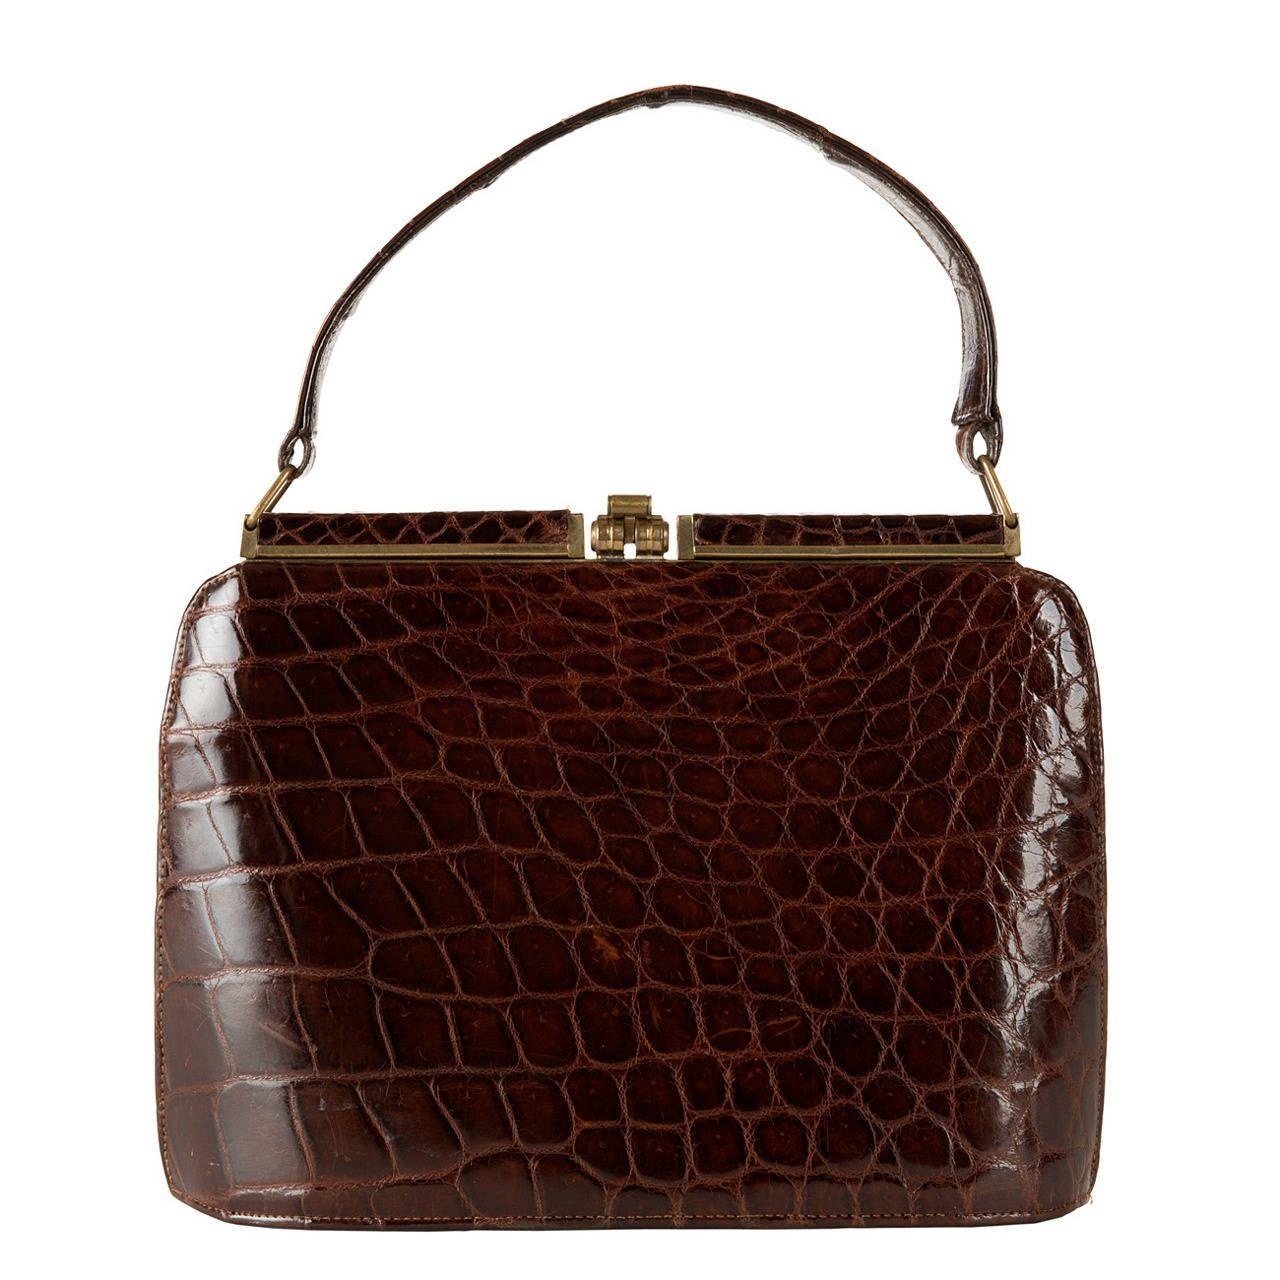 A Vintage Dark Brown Crocodile Handbag   From a collection of rare vintage handbags and purses at https://www.1stdibs.com/fashion/accessories/handbags-purses/